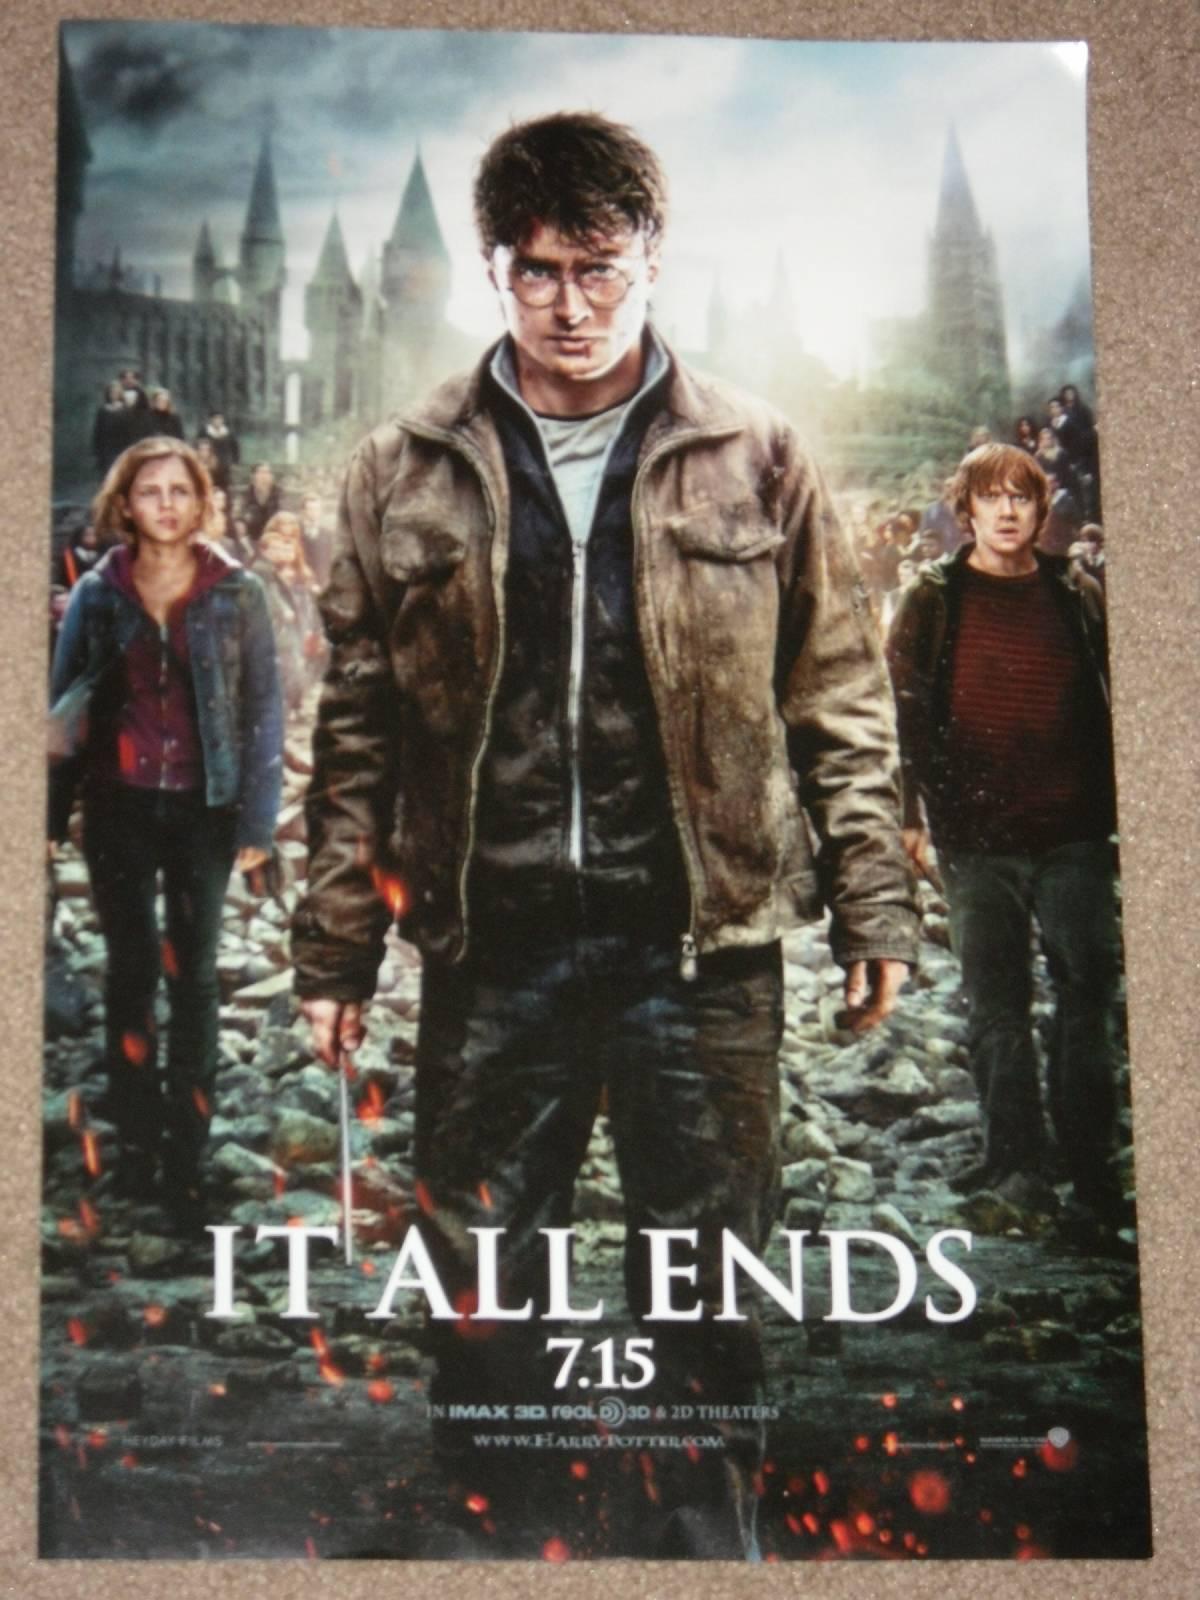 Harry Potter Deathly Hallows Pt 2 11 5x17 Movie Poster Ebay